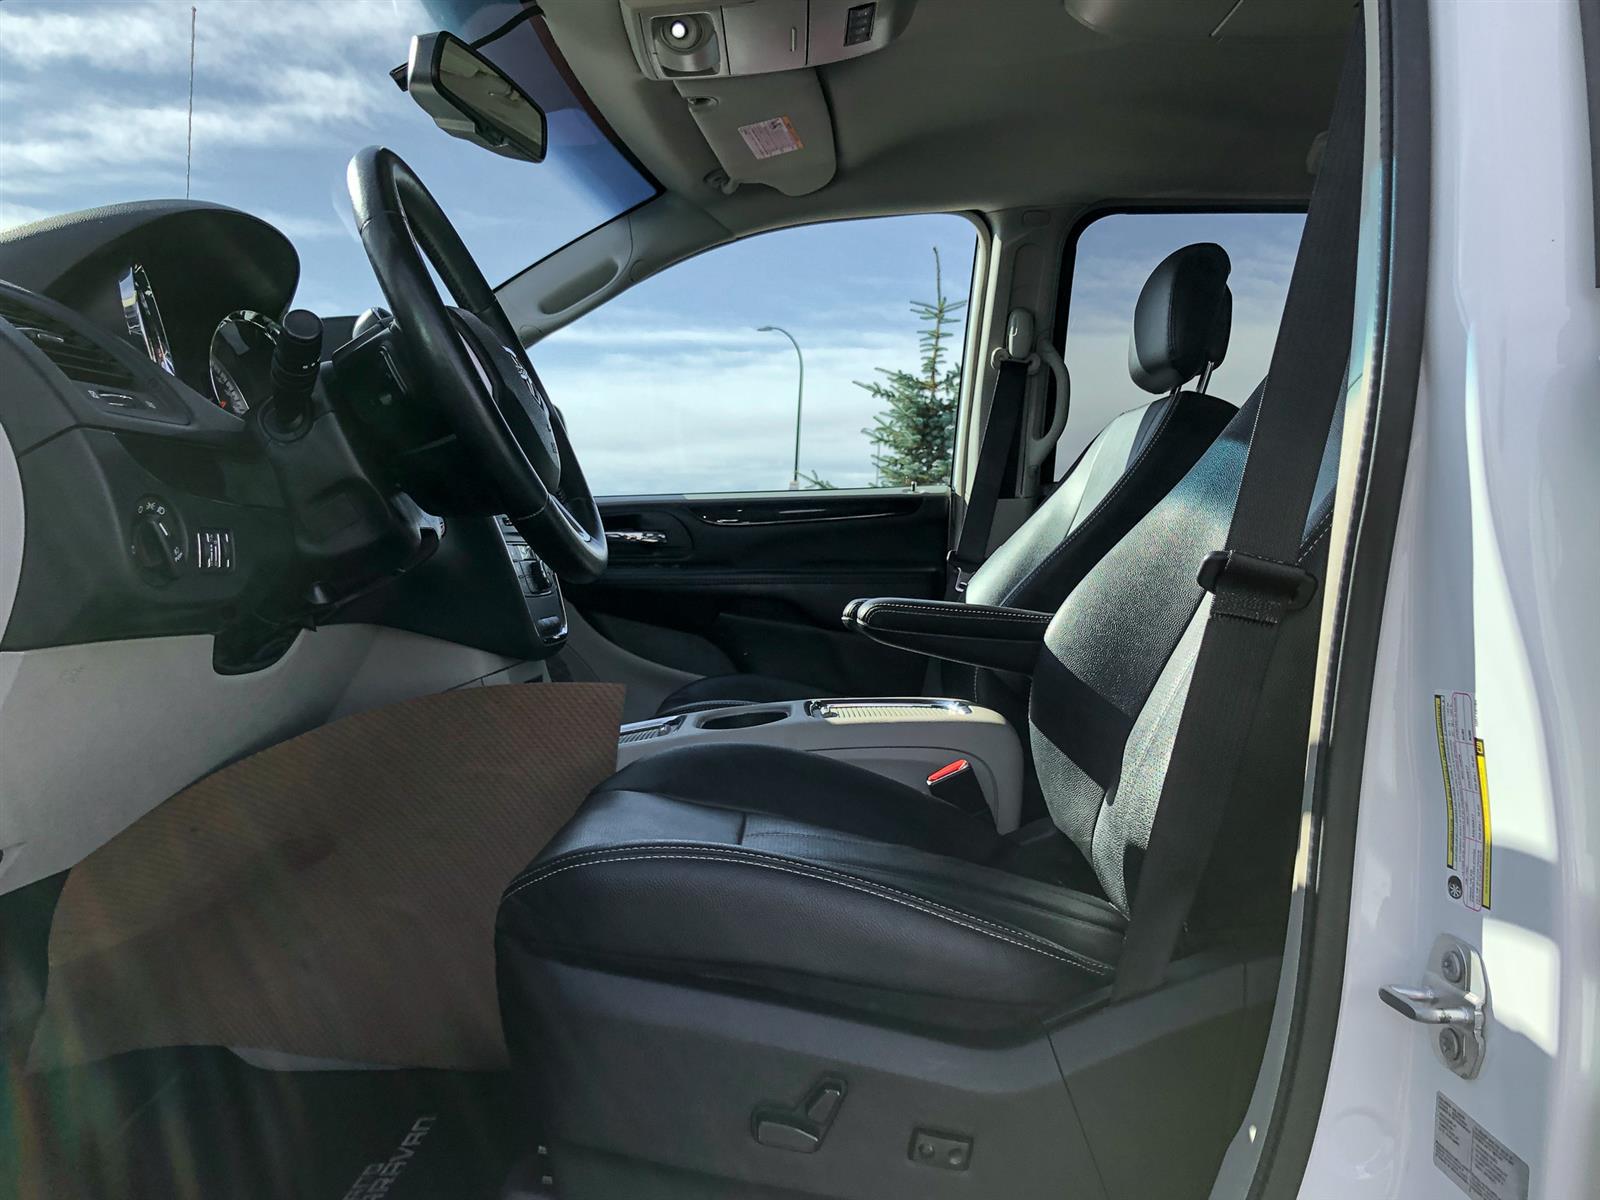 2017 Dodge Grand Caravan CREW PLUS | 3.6L V6 | 7 SEATER | REAR VIEW CAMERA | USB CONNECTI